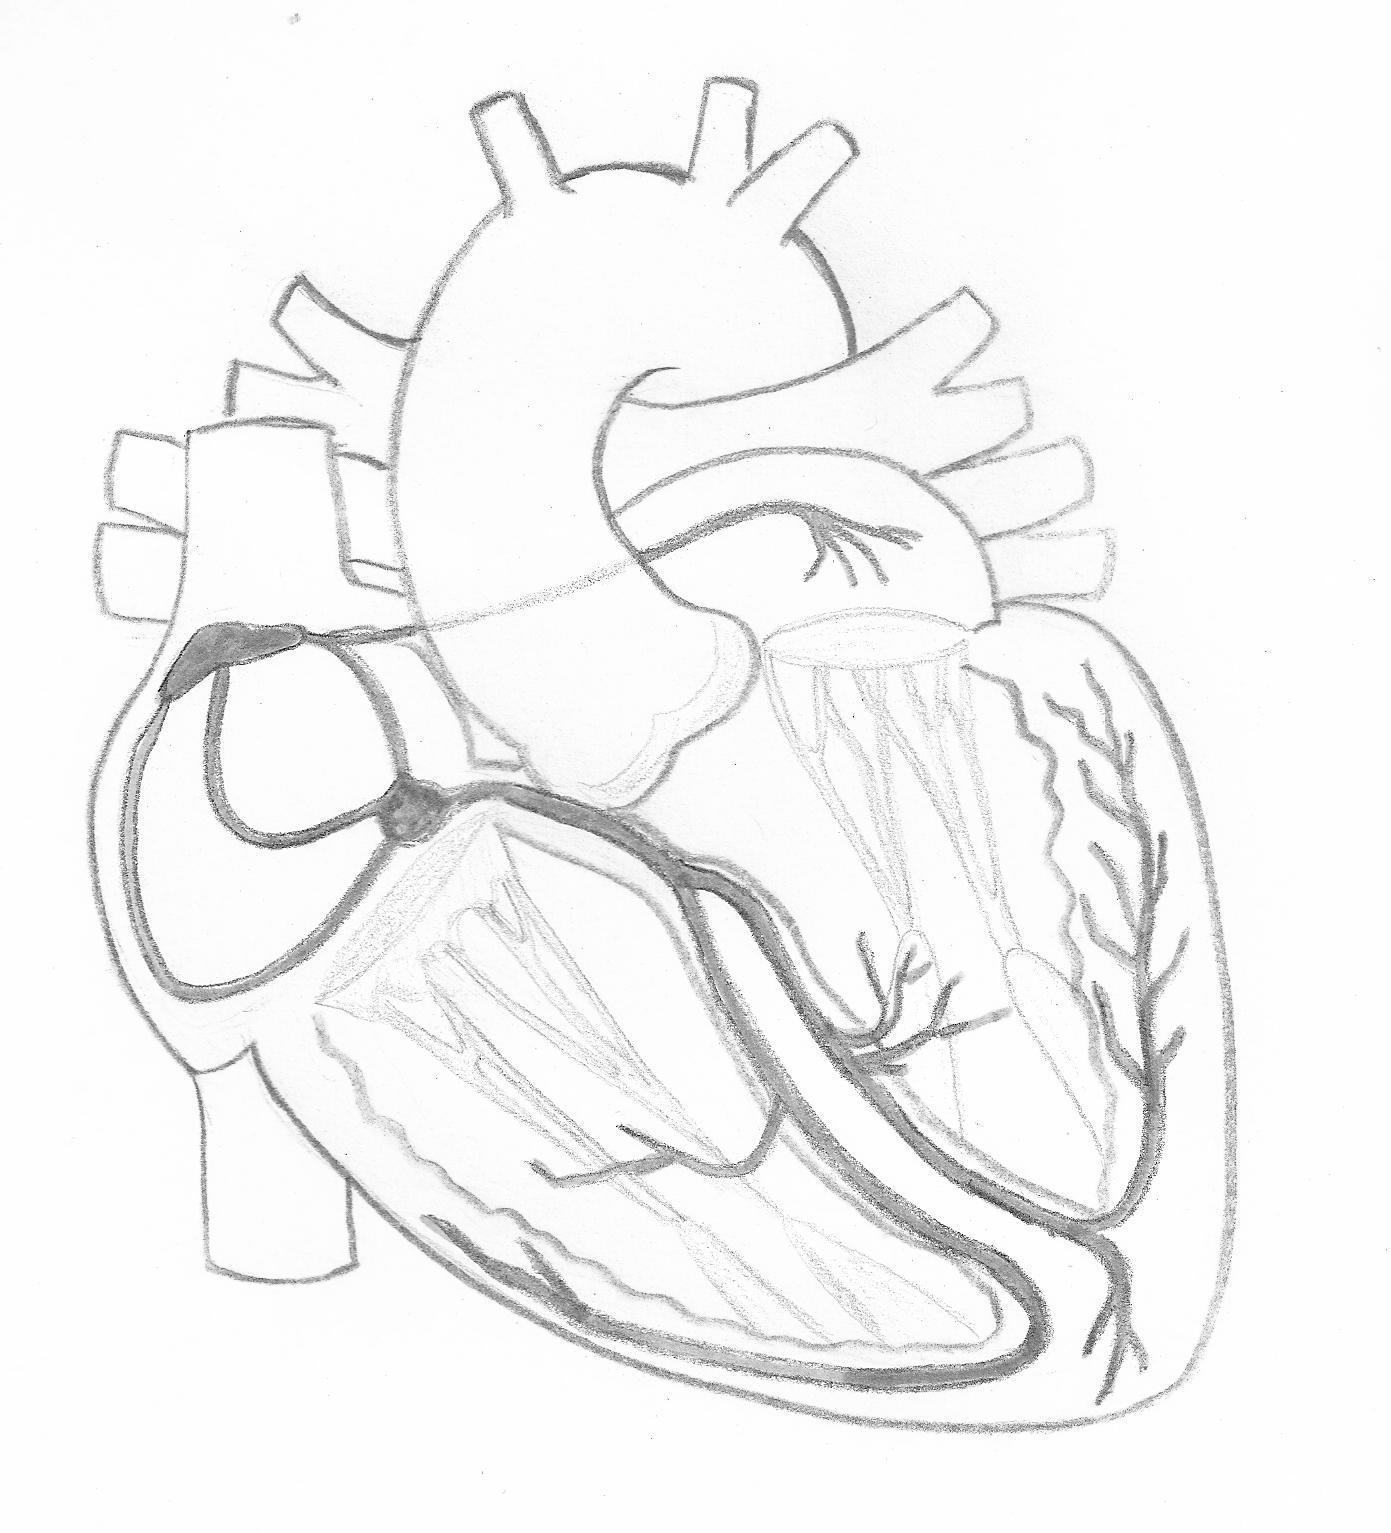 cardiac conduction system in greyscale